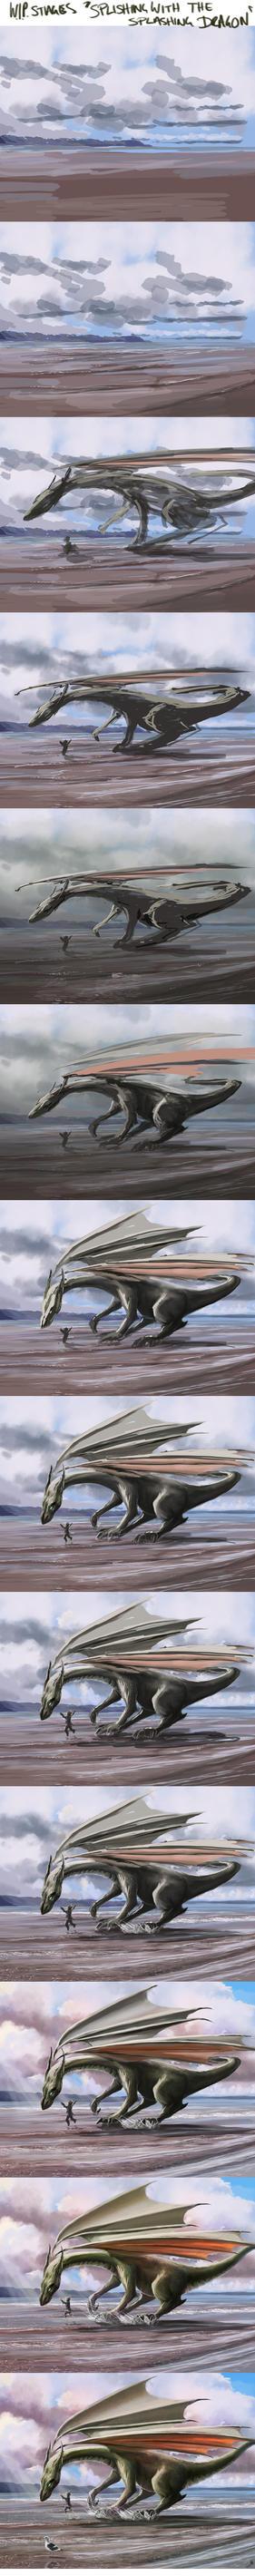 The Splashing Dragon WIP by AndyFairhurst